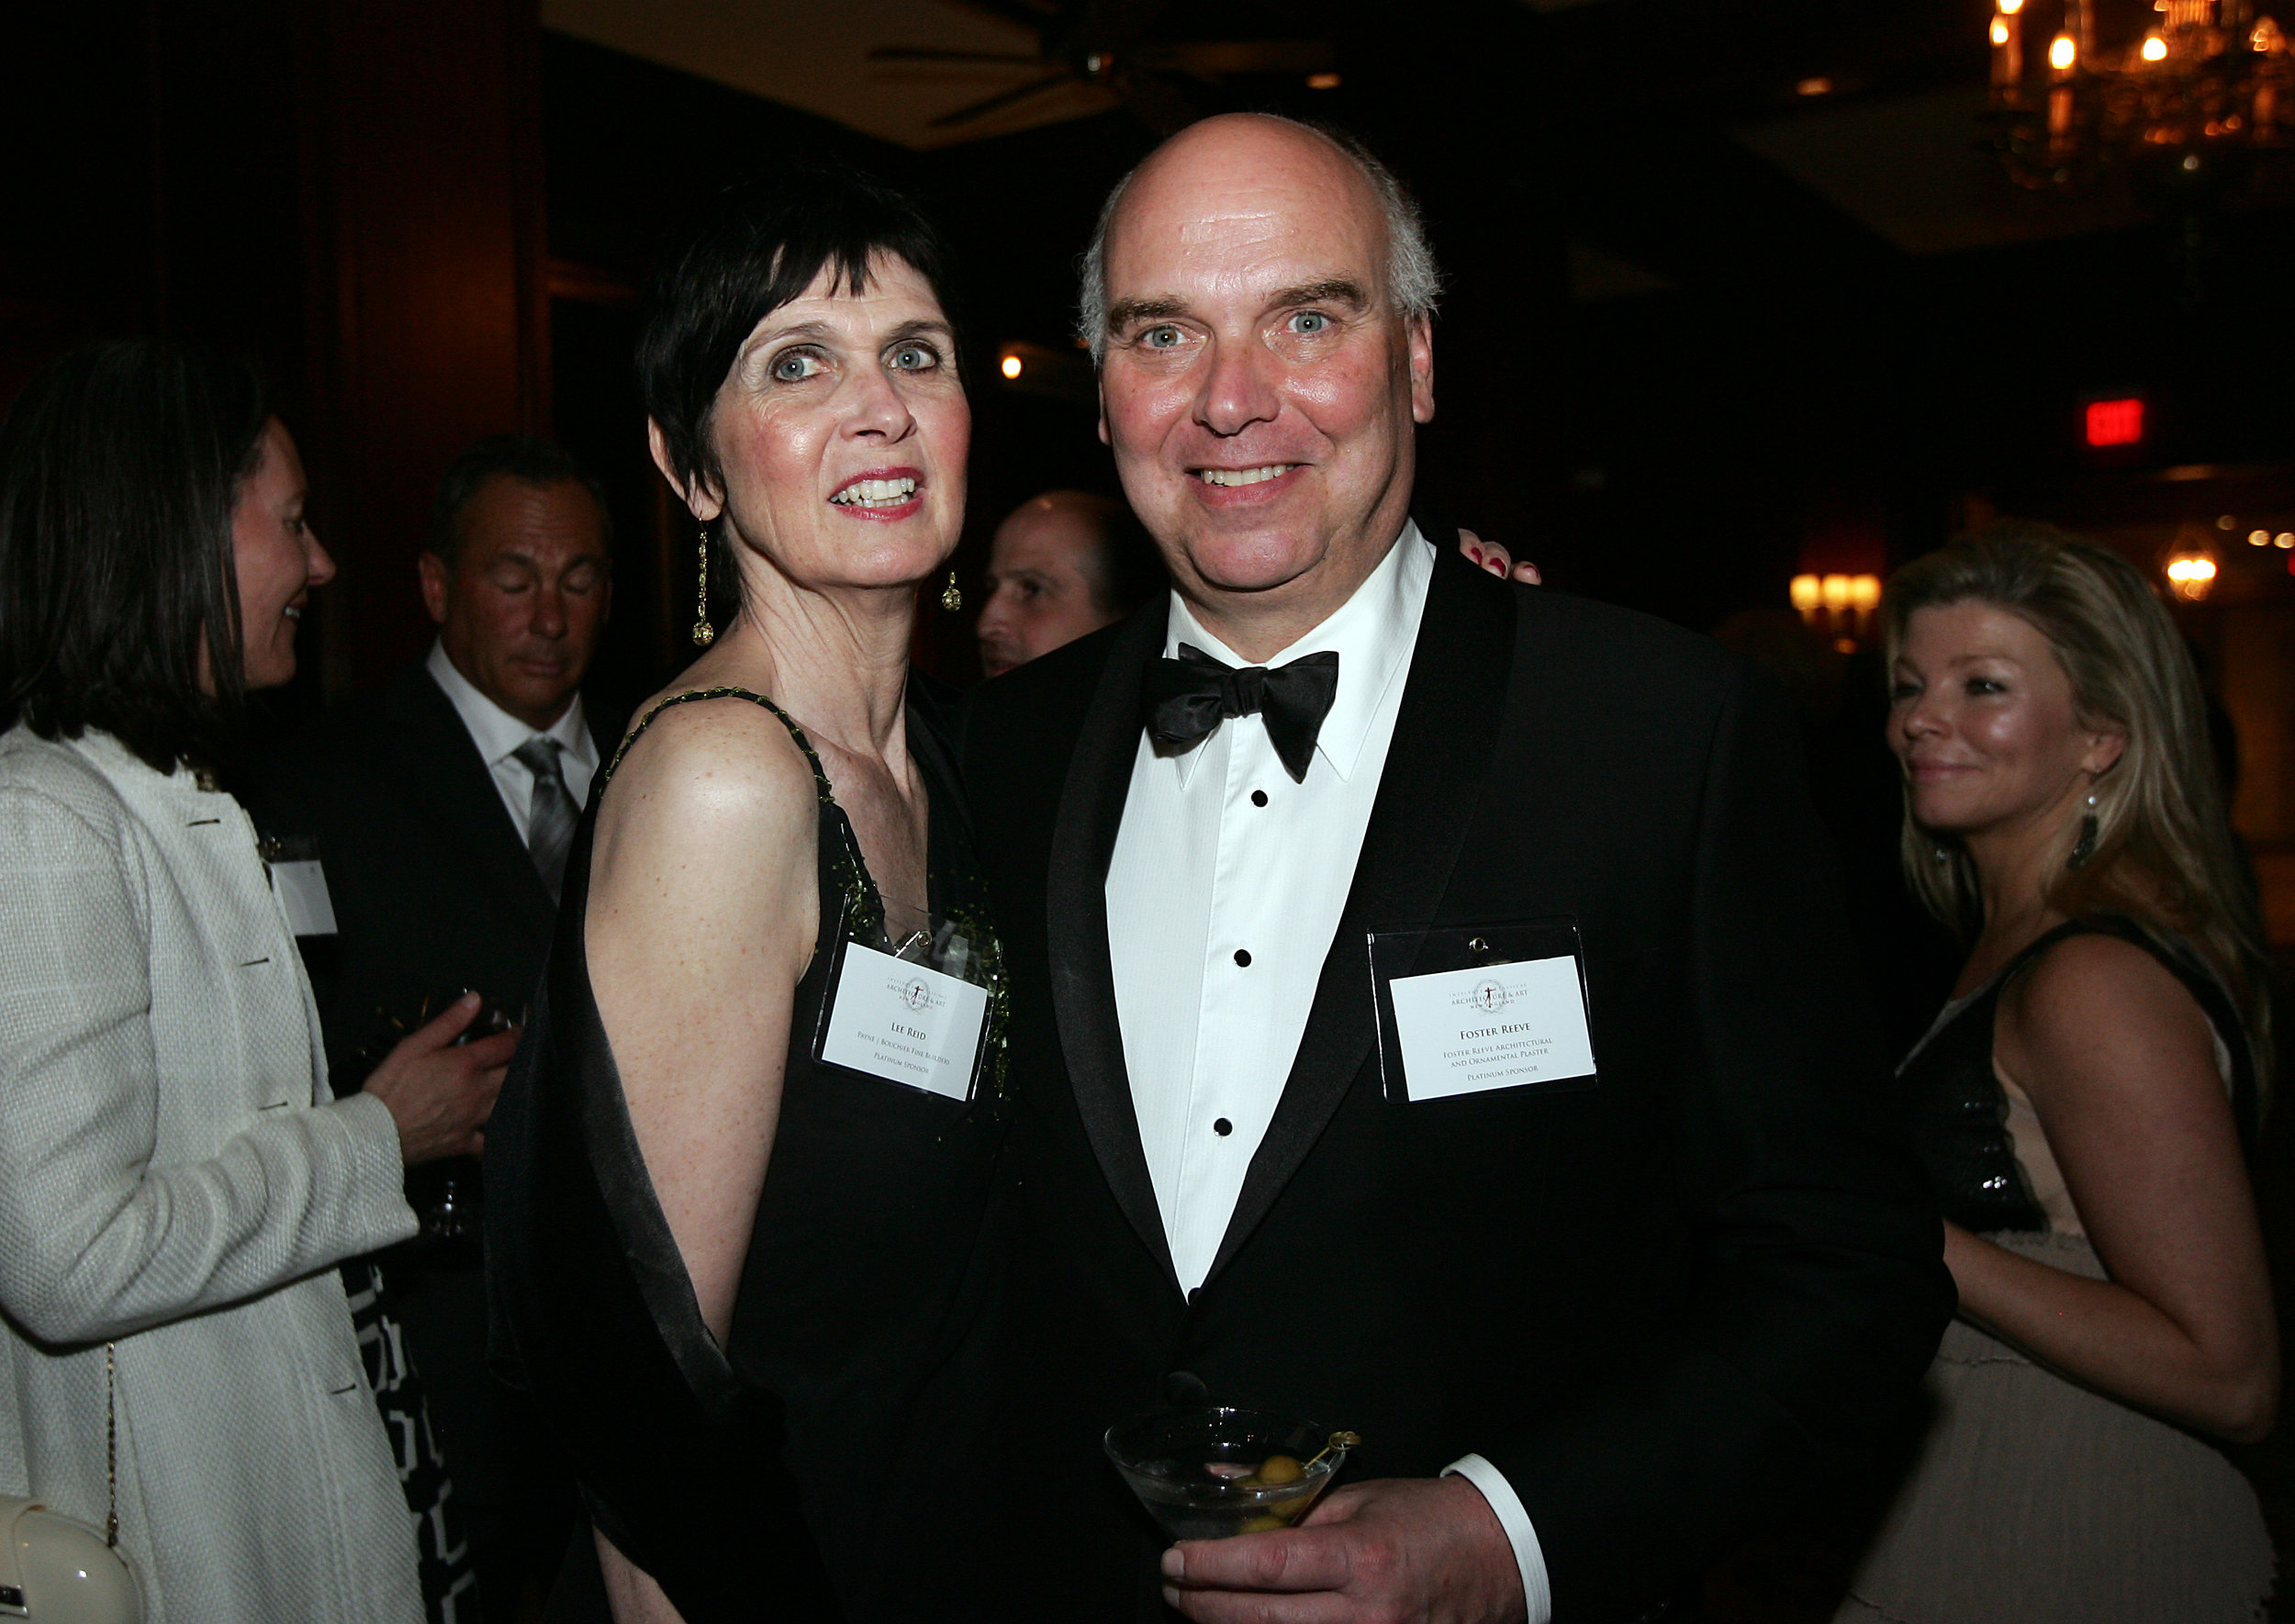 Board member Lee Reid, Foster Reeve